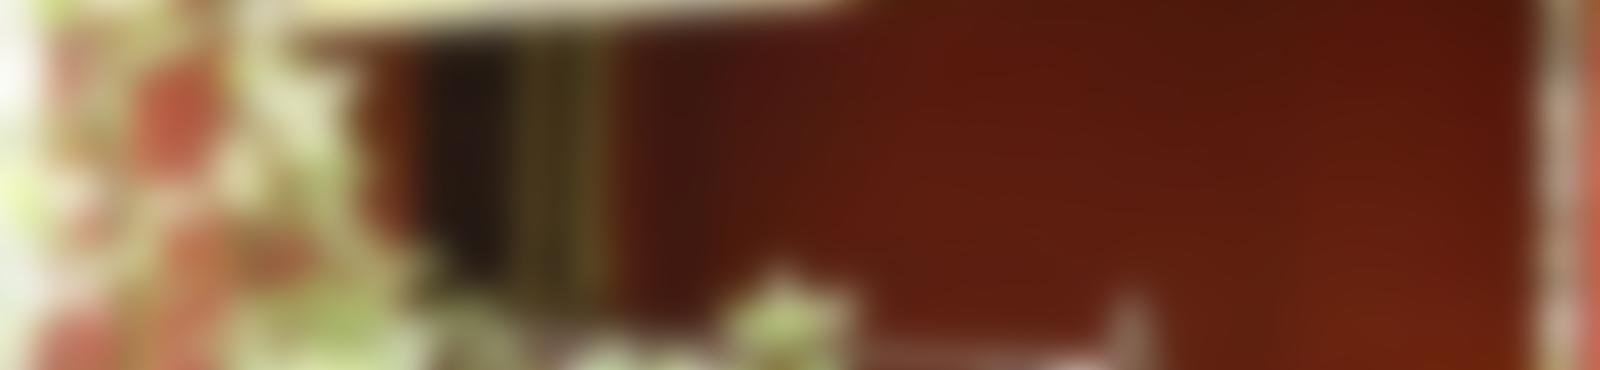 Blurred werkstattkino